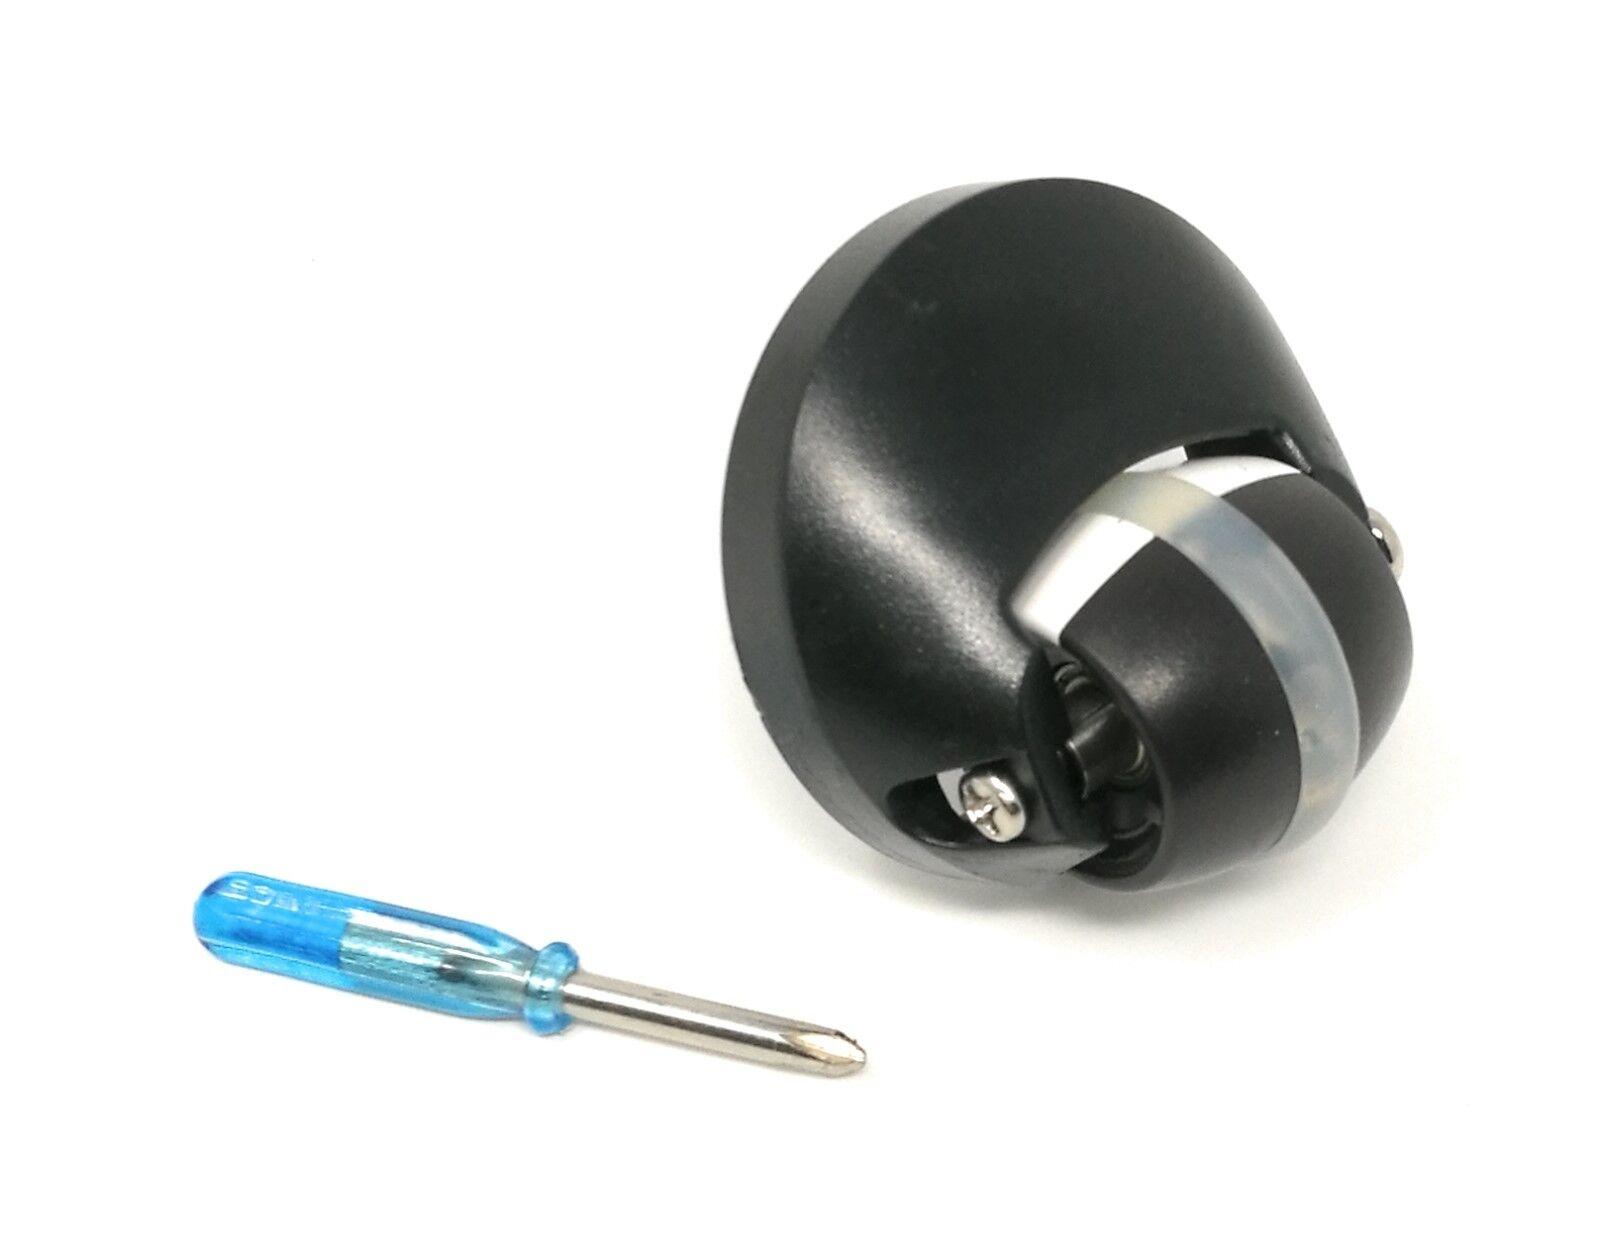 Vorderrad Modul Caster Wheel Für IRobot Roomba Vacuum Cleaning Cleaner Tool